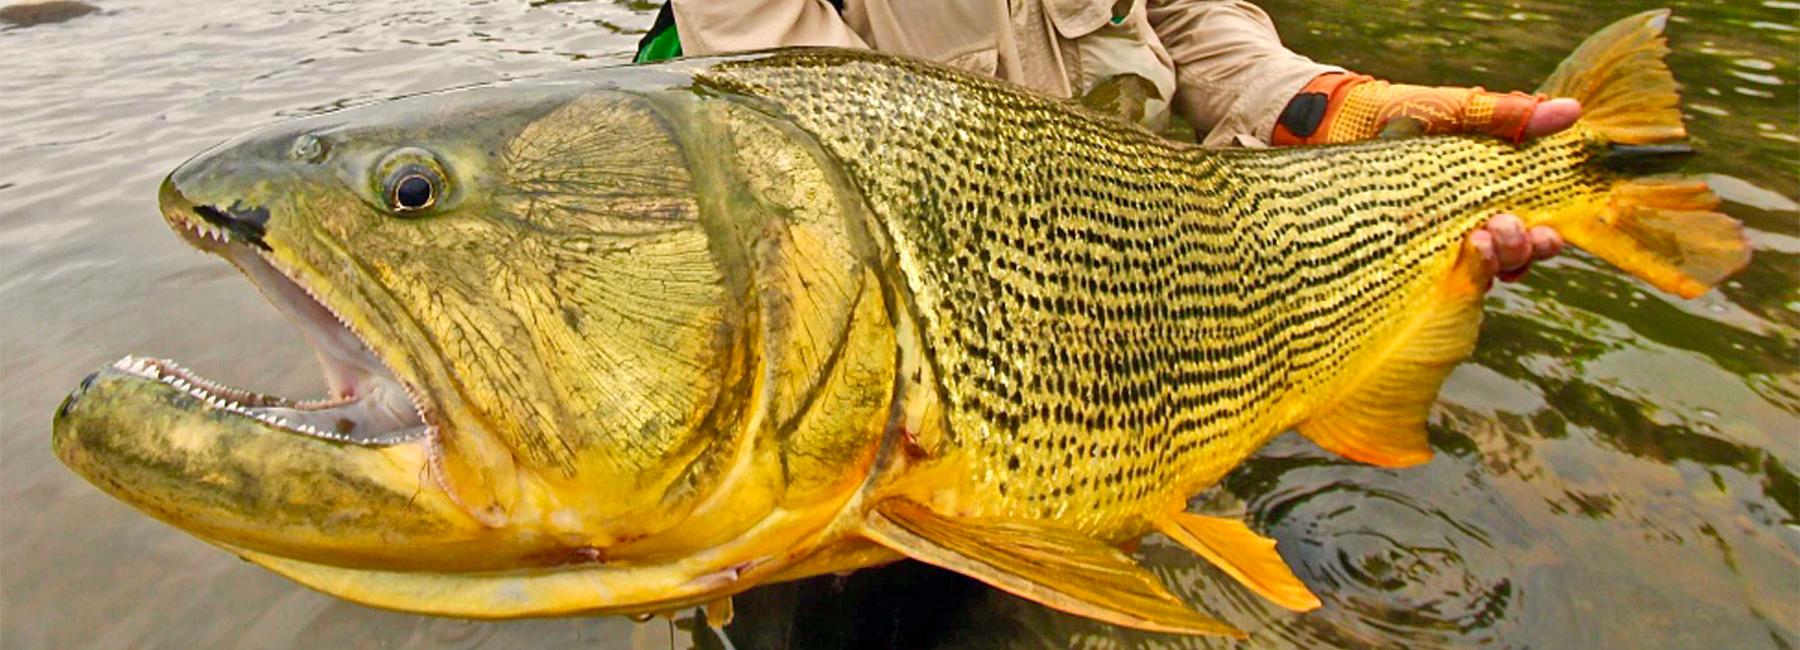 Golden dorado fly fishing dorado fly fishing lodges for Golden dorado fish